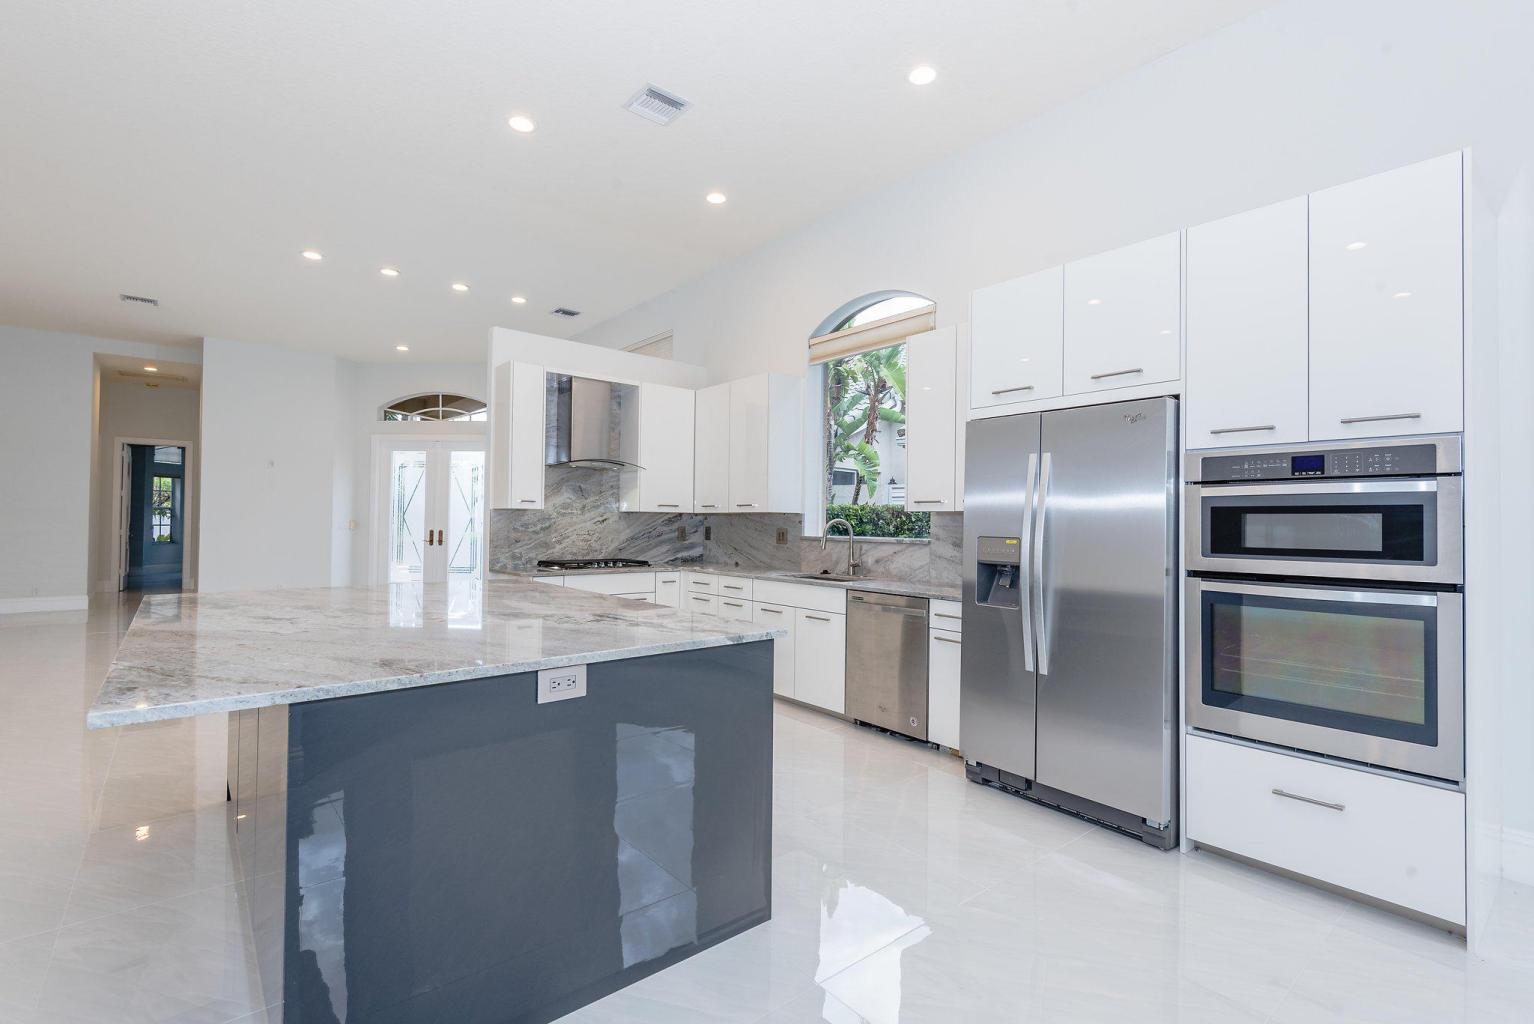 118 Banyan Isle Drive, Palm Beach Gardens, Florida 33418, 3 Bedrooms Bedrooms, ,3 BathroomsBathrooms,A,Single family,Banyan Isle,RX-10409786